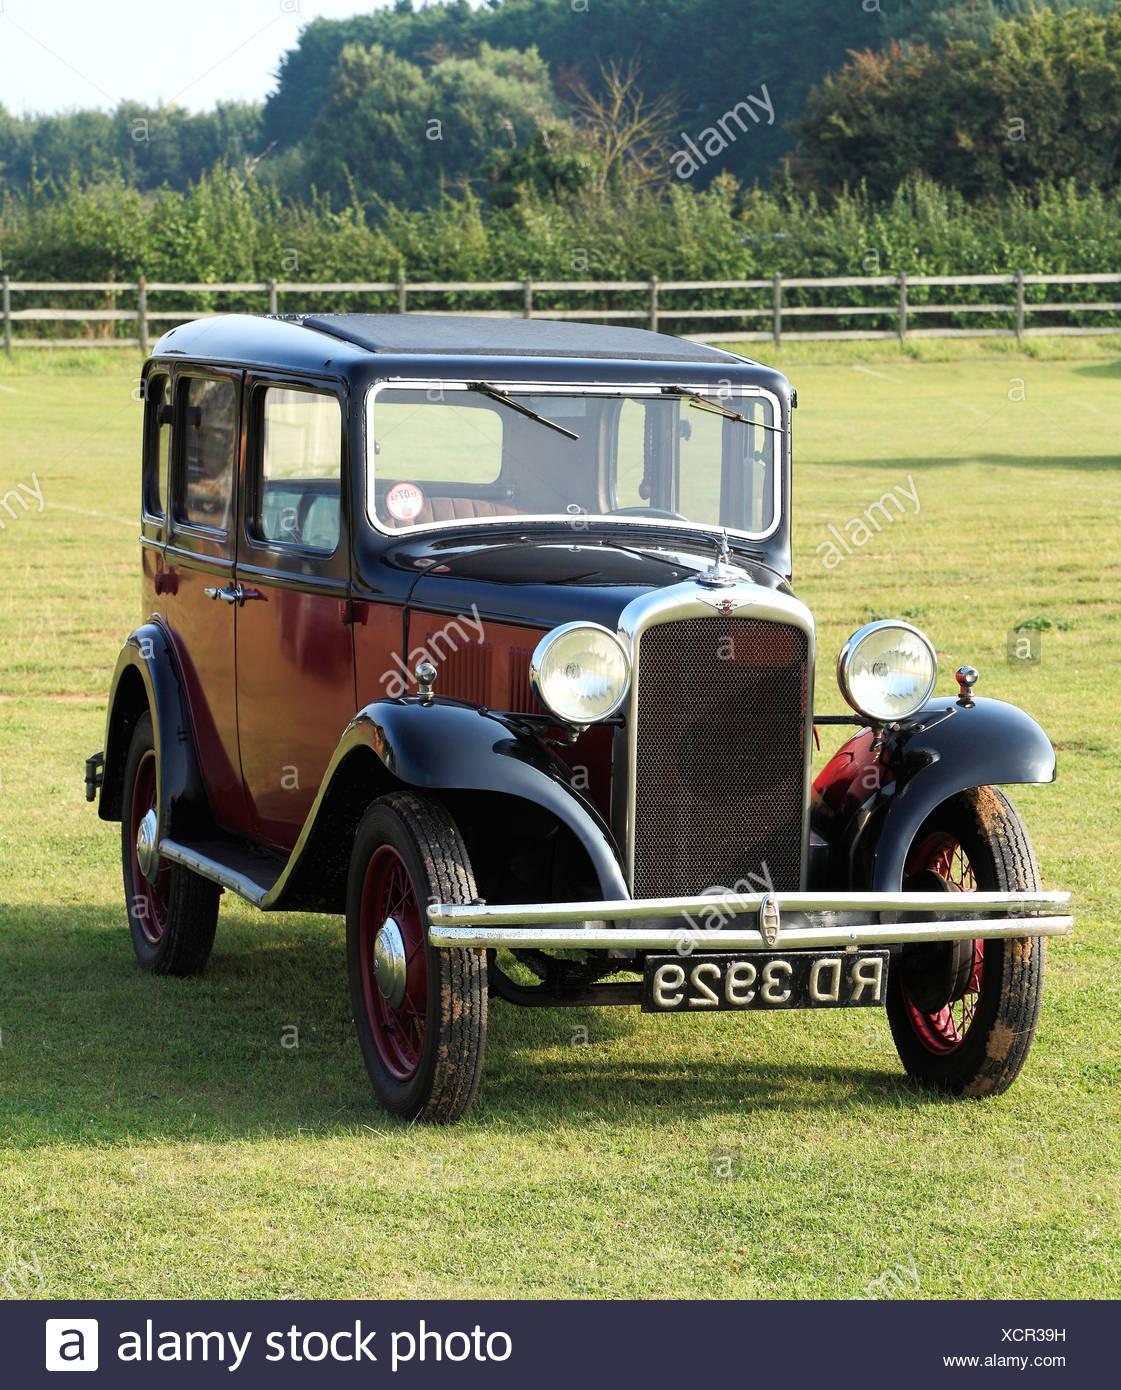 Hillman Minx, 1932 vintage motor car, England UK British classic cars motor motors automobile automobiles - Stock Image